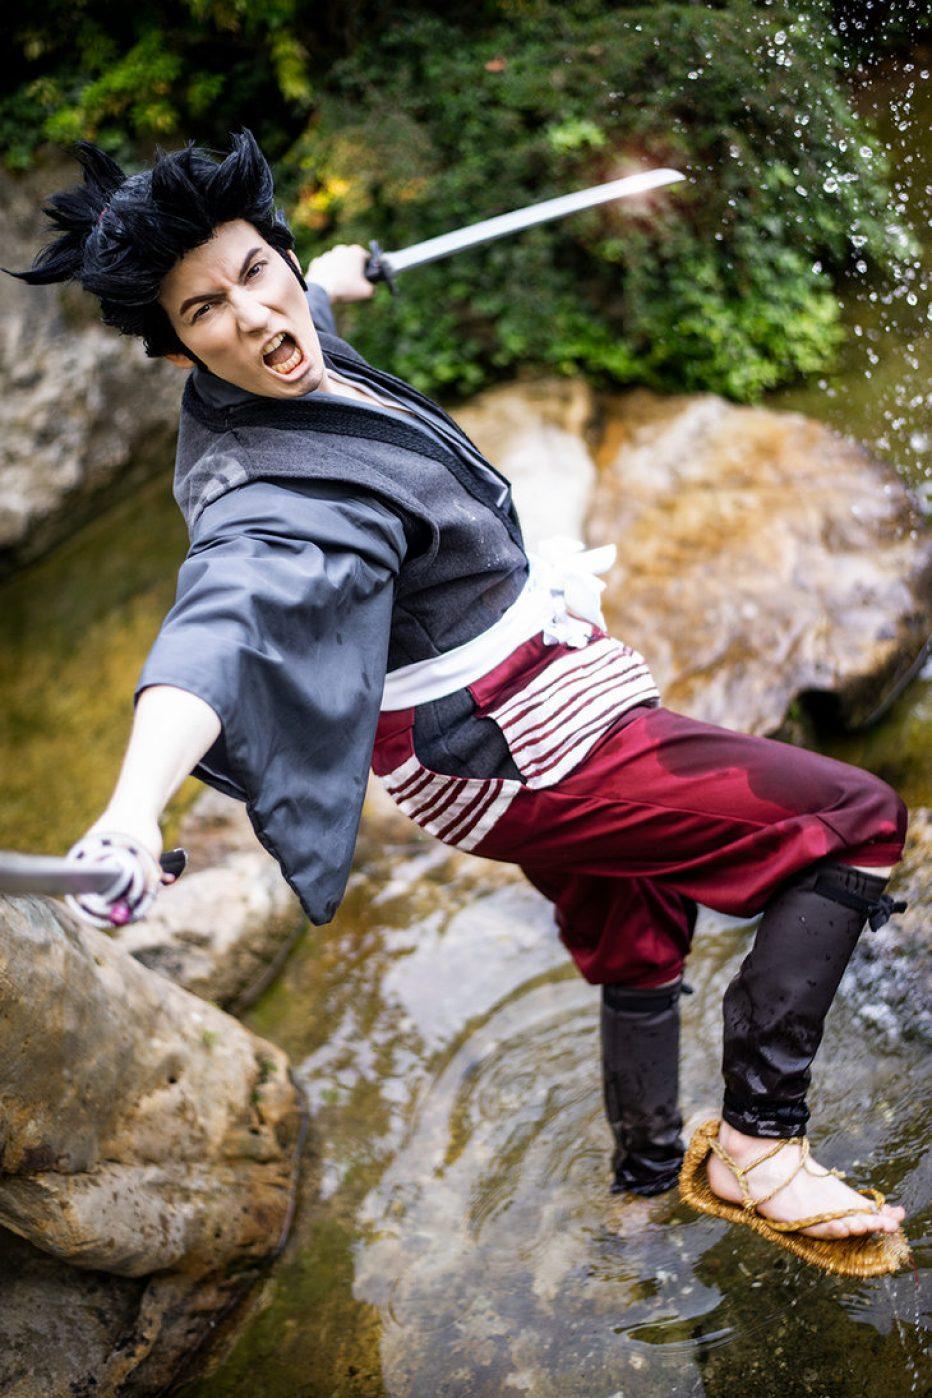 Kazuma-Kiryu-Yakuza-Cosplay-Gamers-Heroes-1.jpg